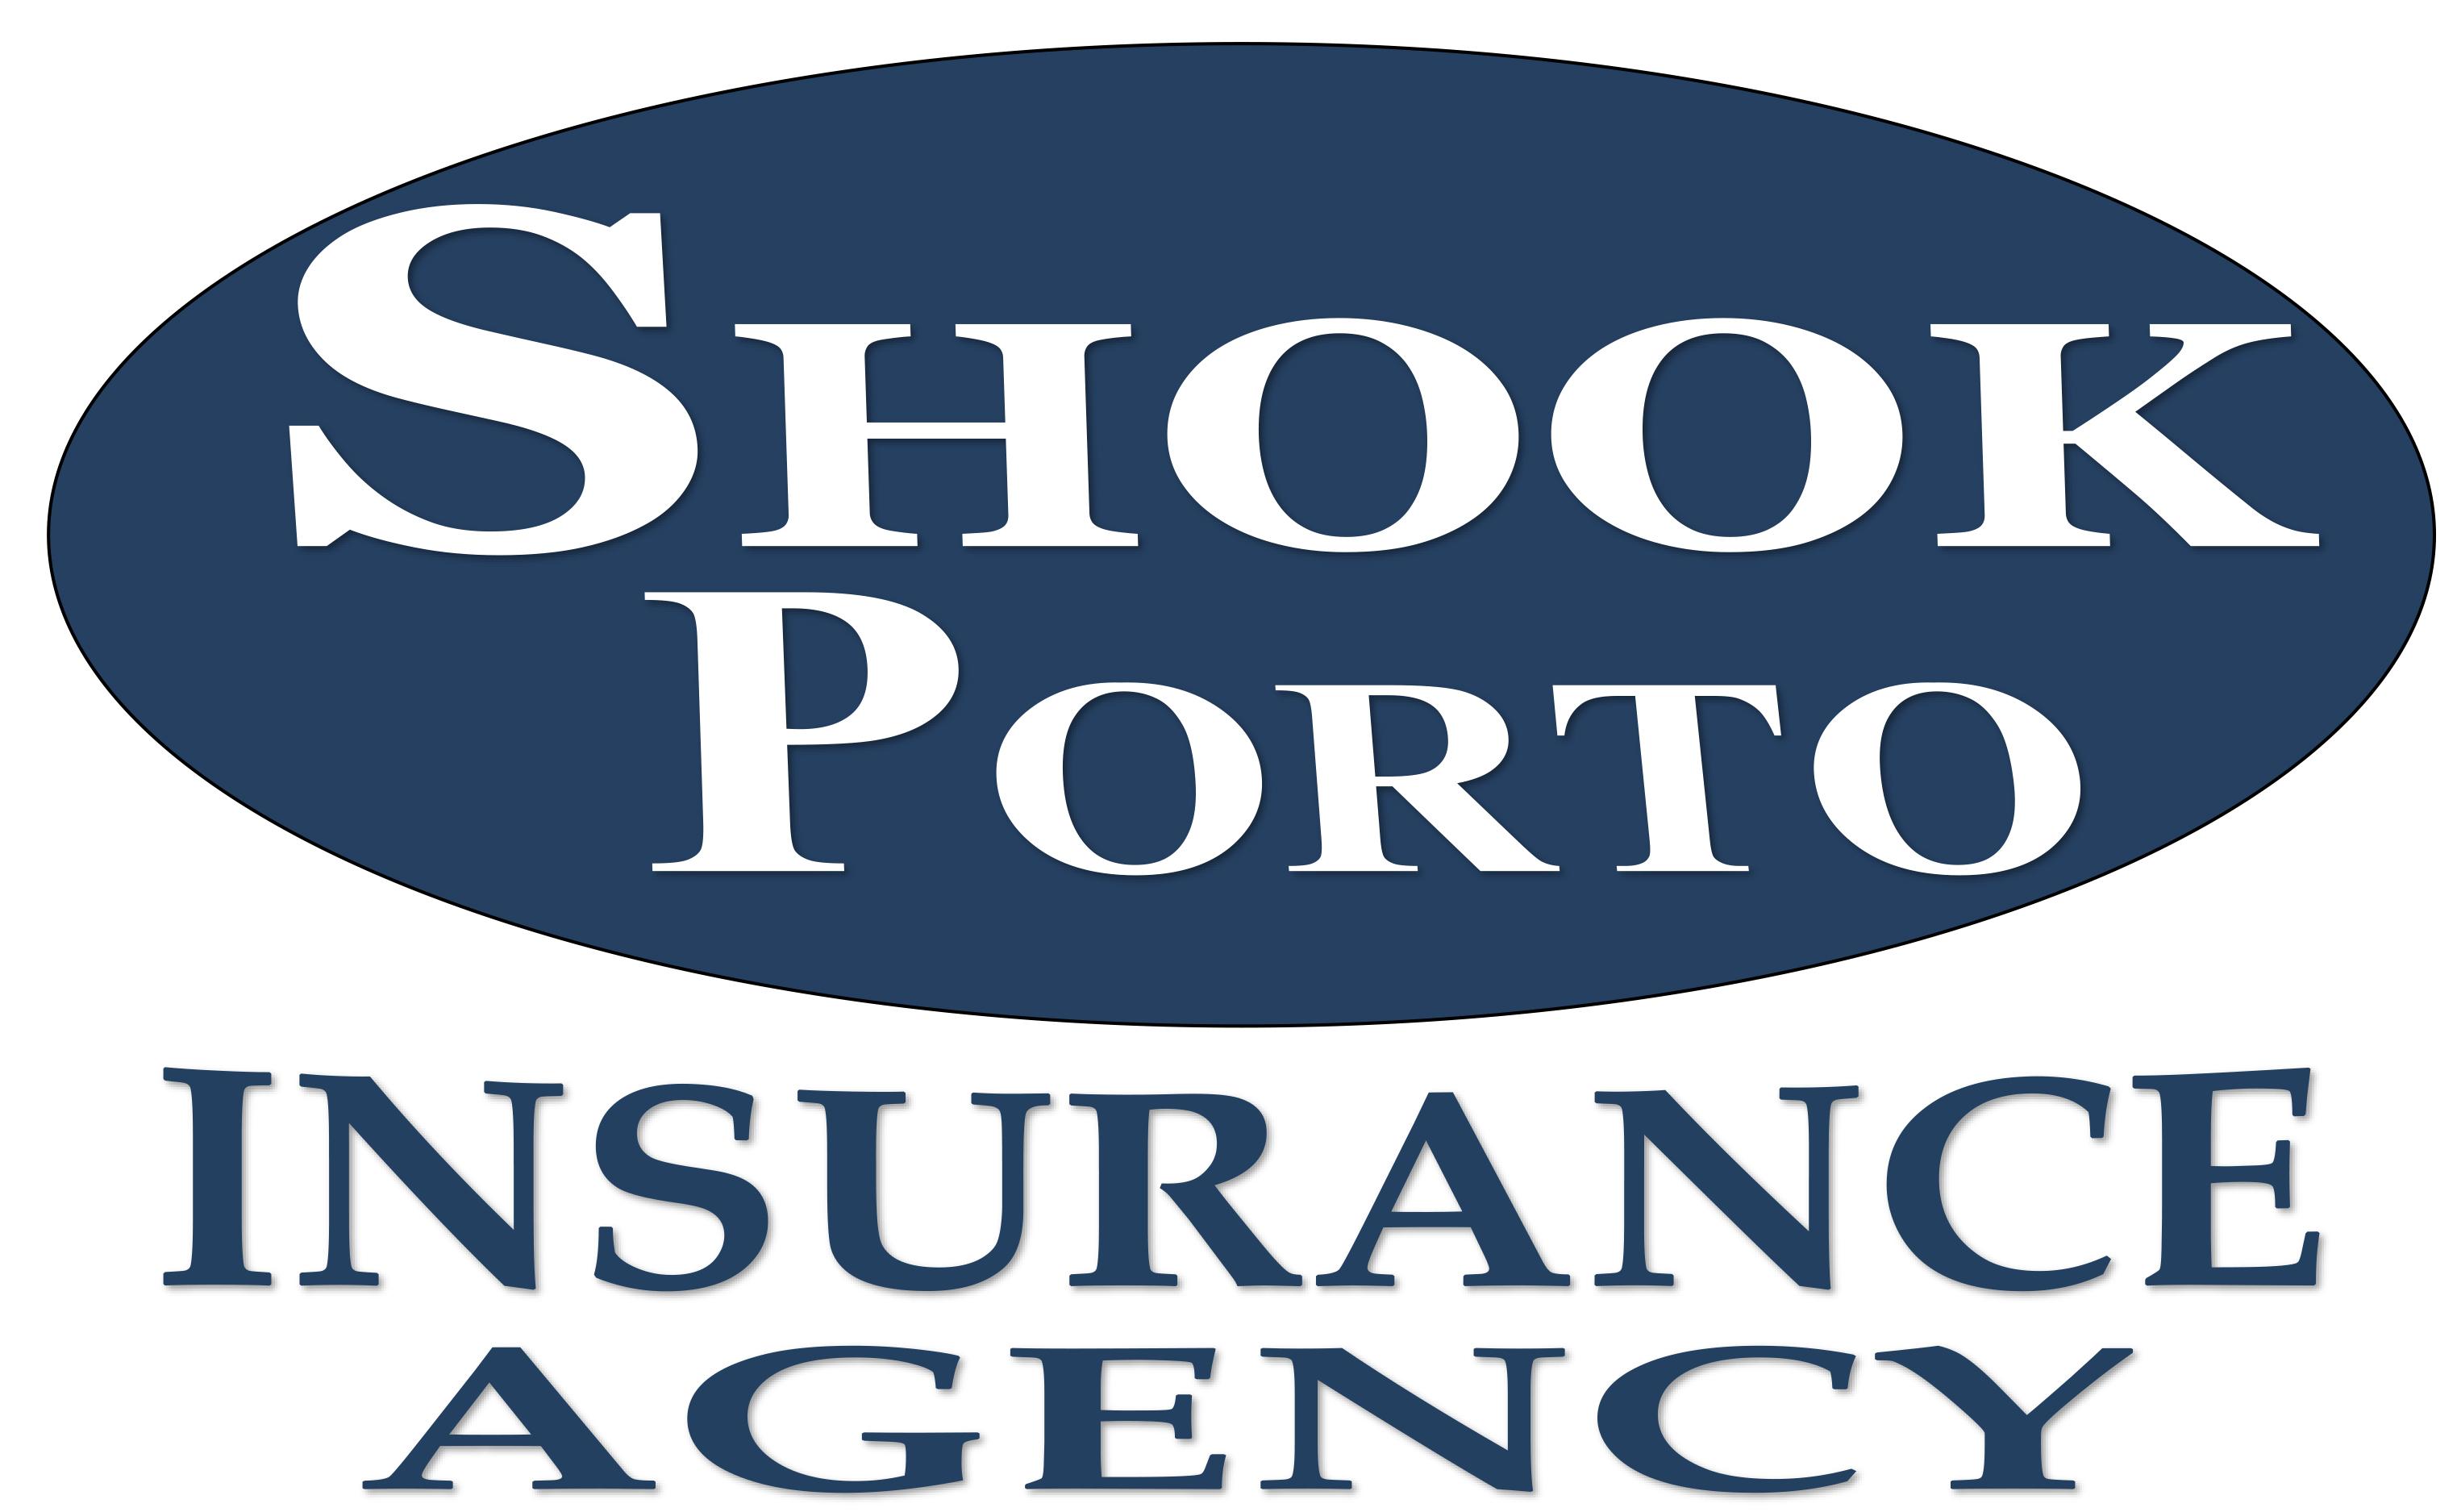 shook-porto-logo